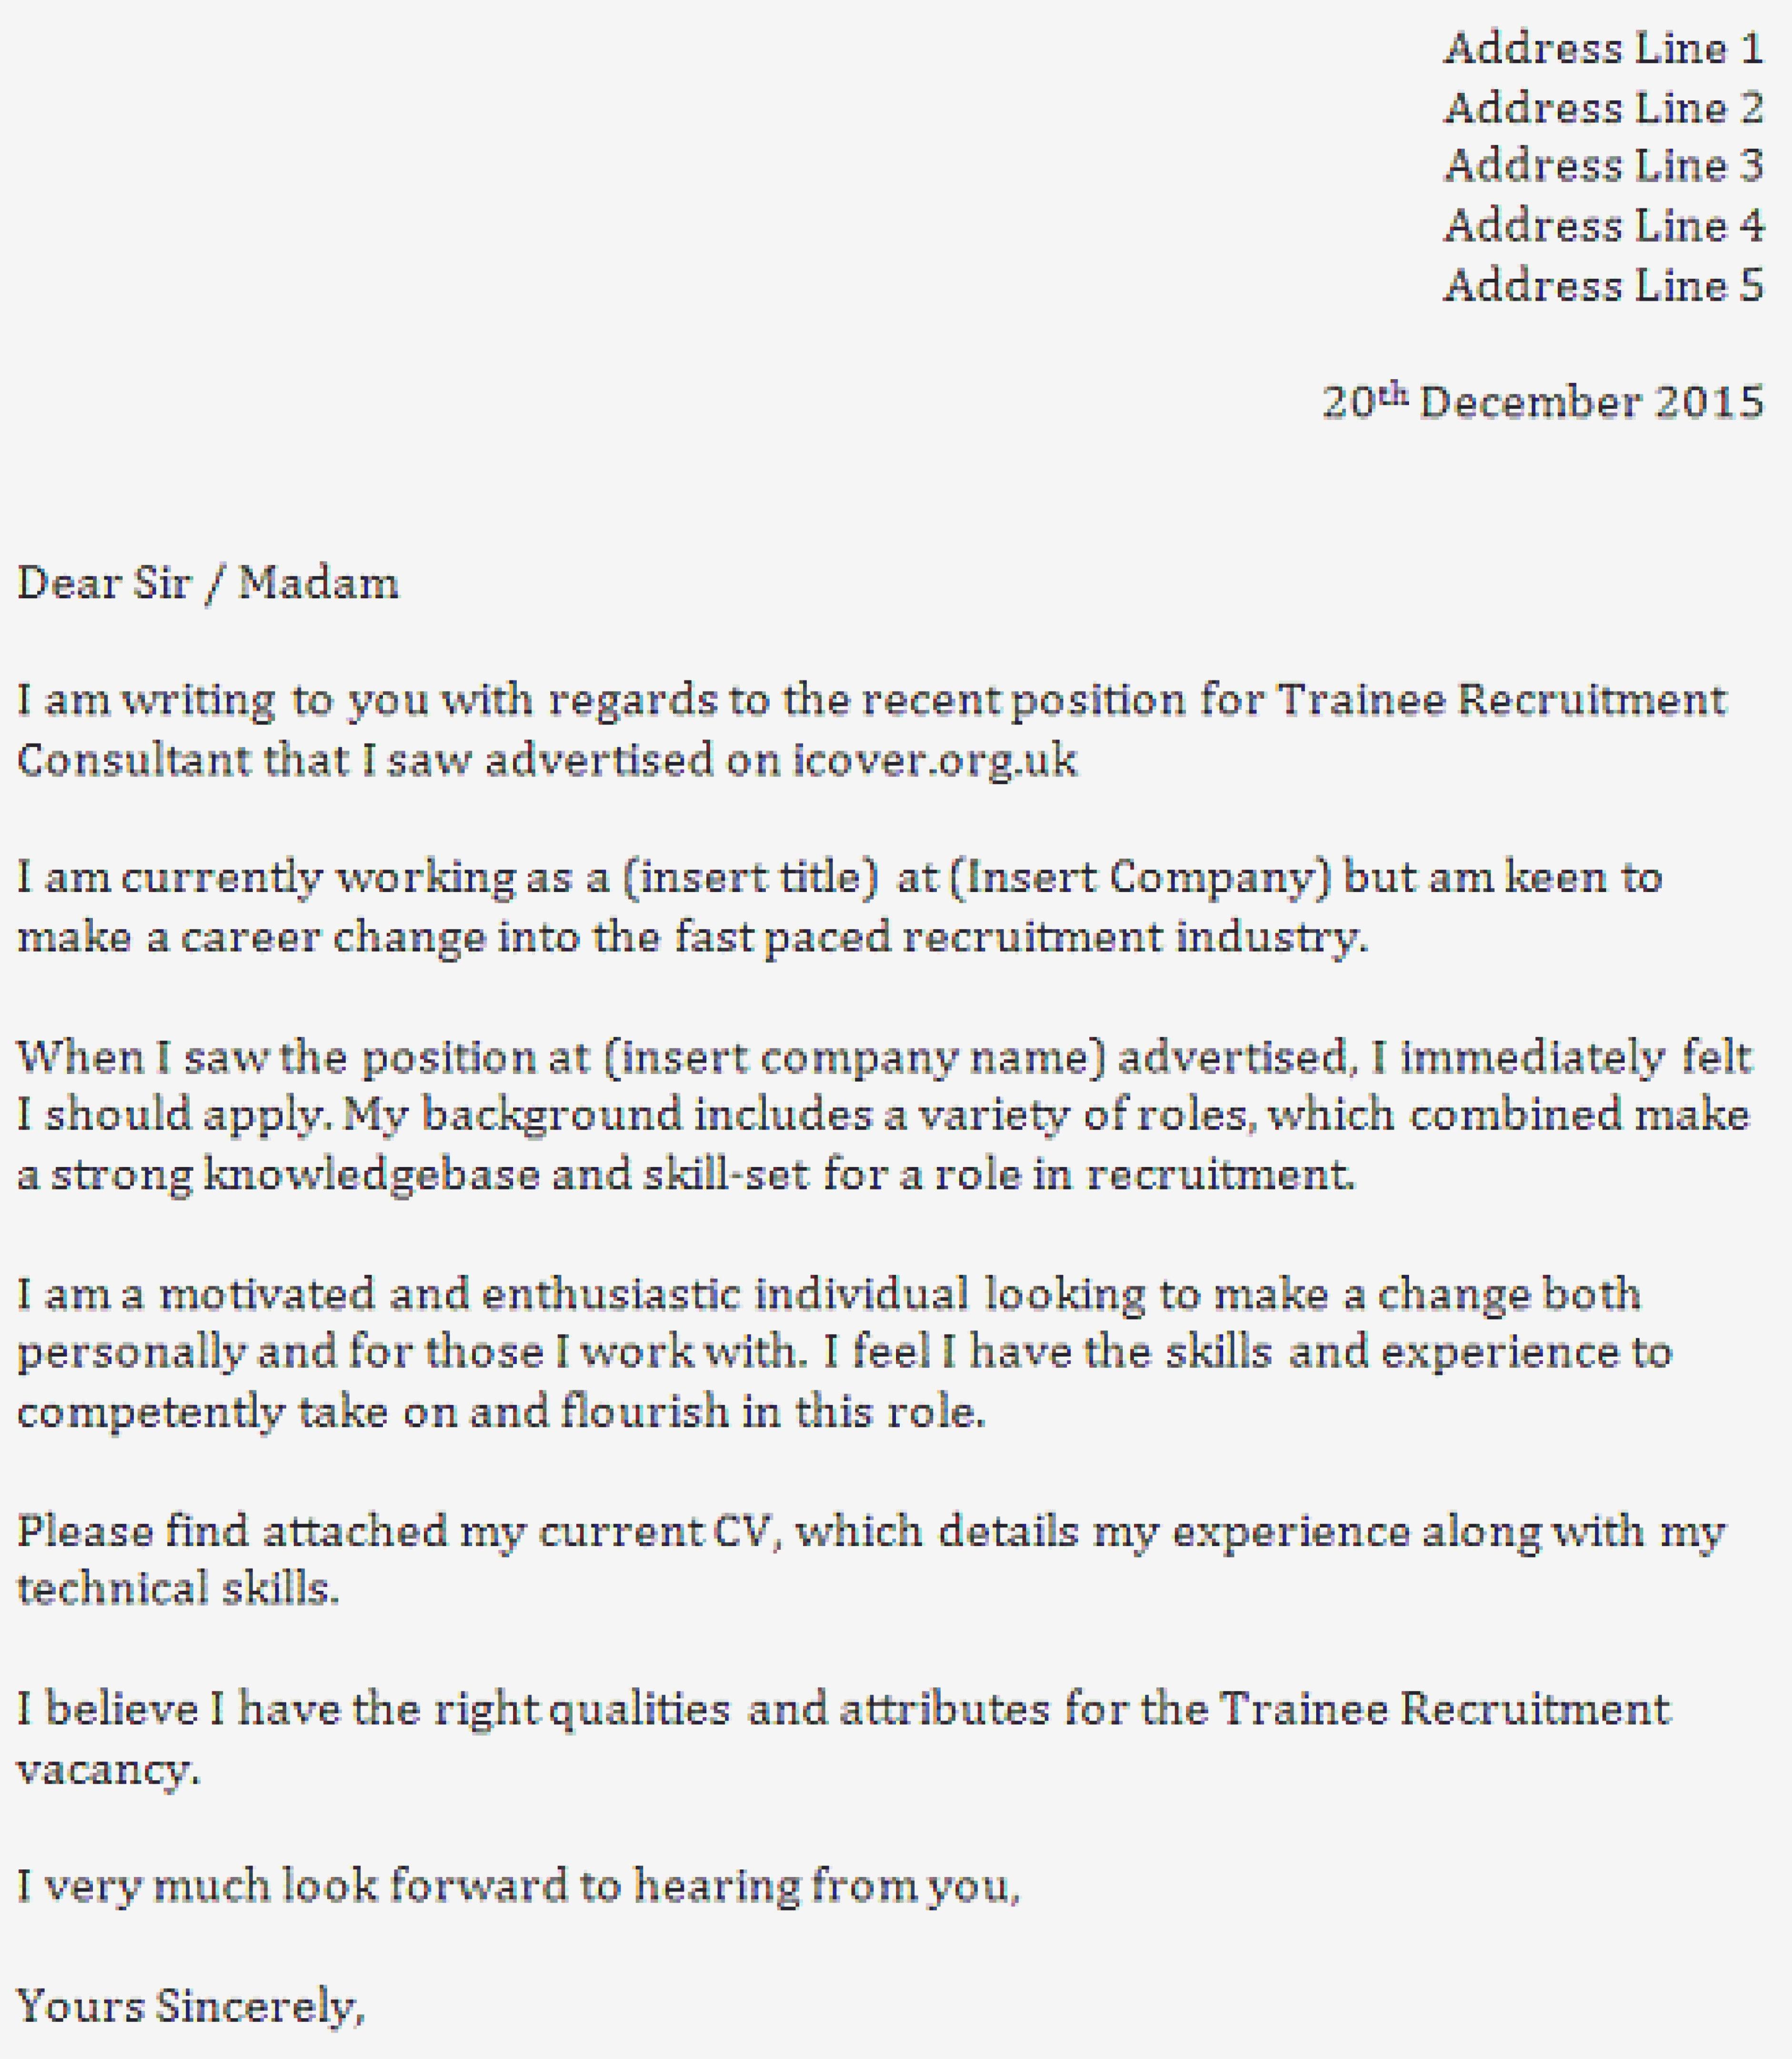 Template Business Letter Job Cover Letter Job Letter Writing A Cover Letter